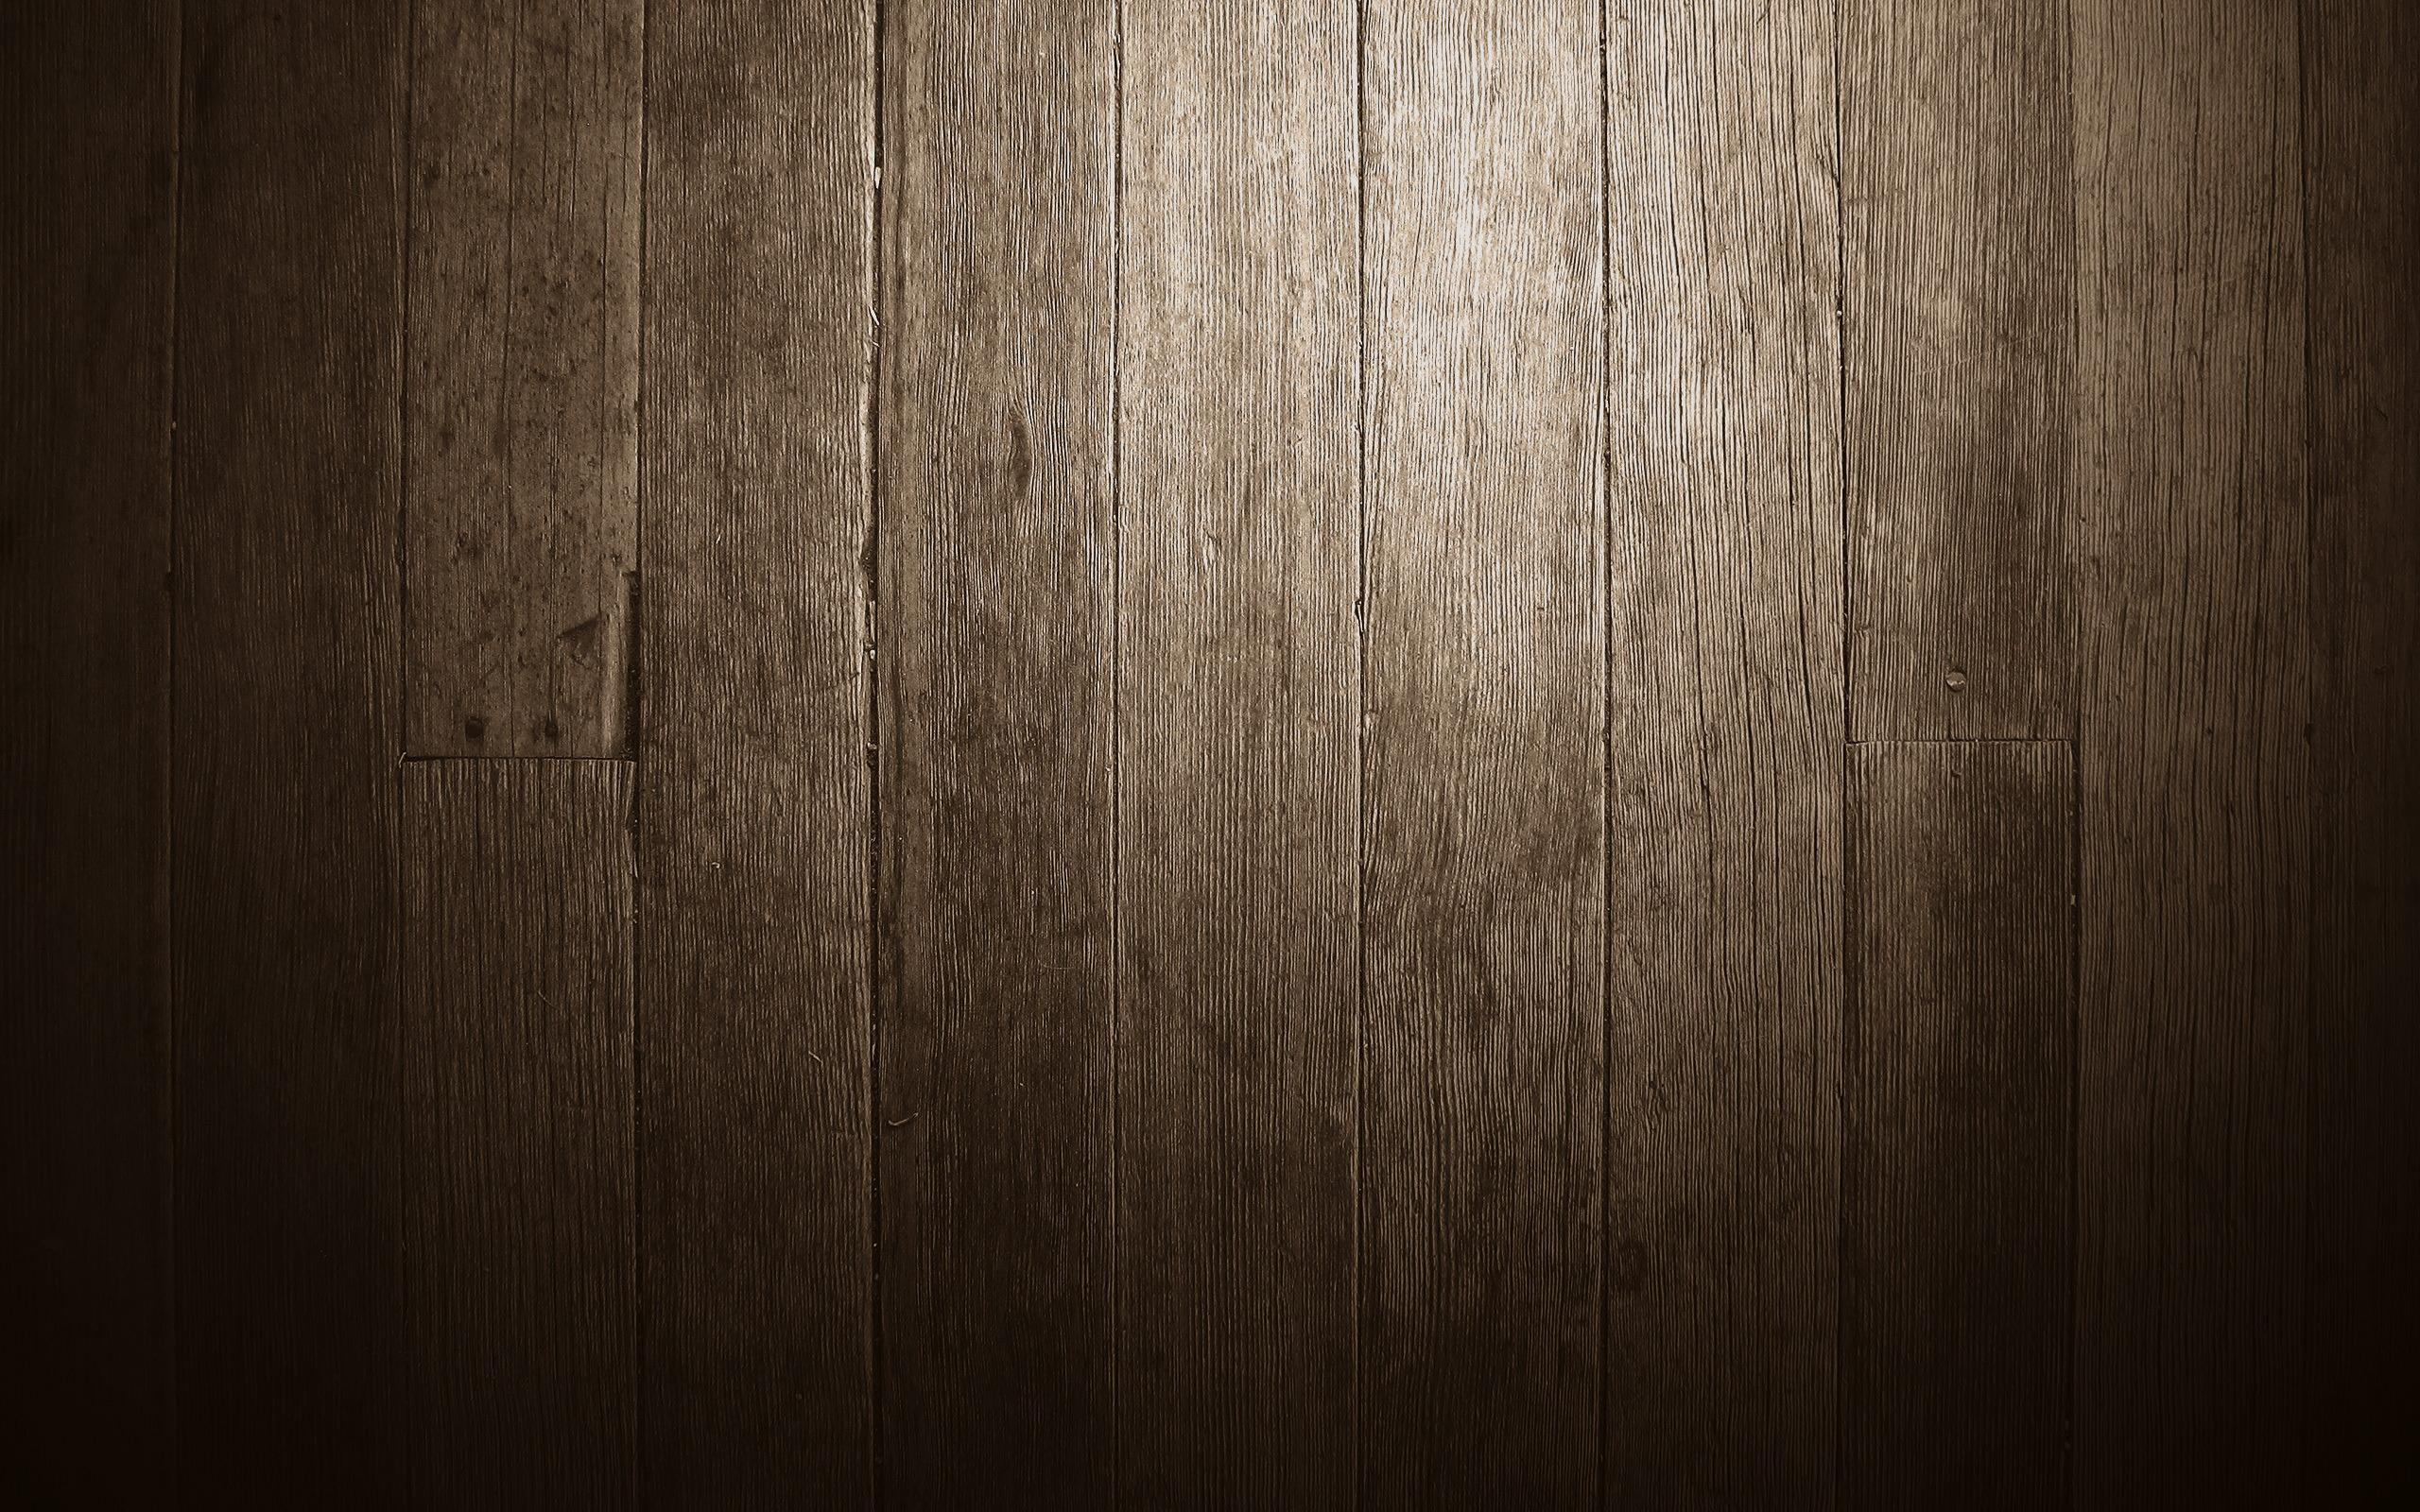 Wood Texture Floor Wall Darkness Hardwood Fresno Flooring Laminate Stain